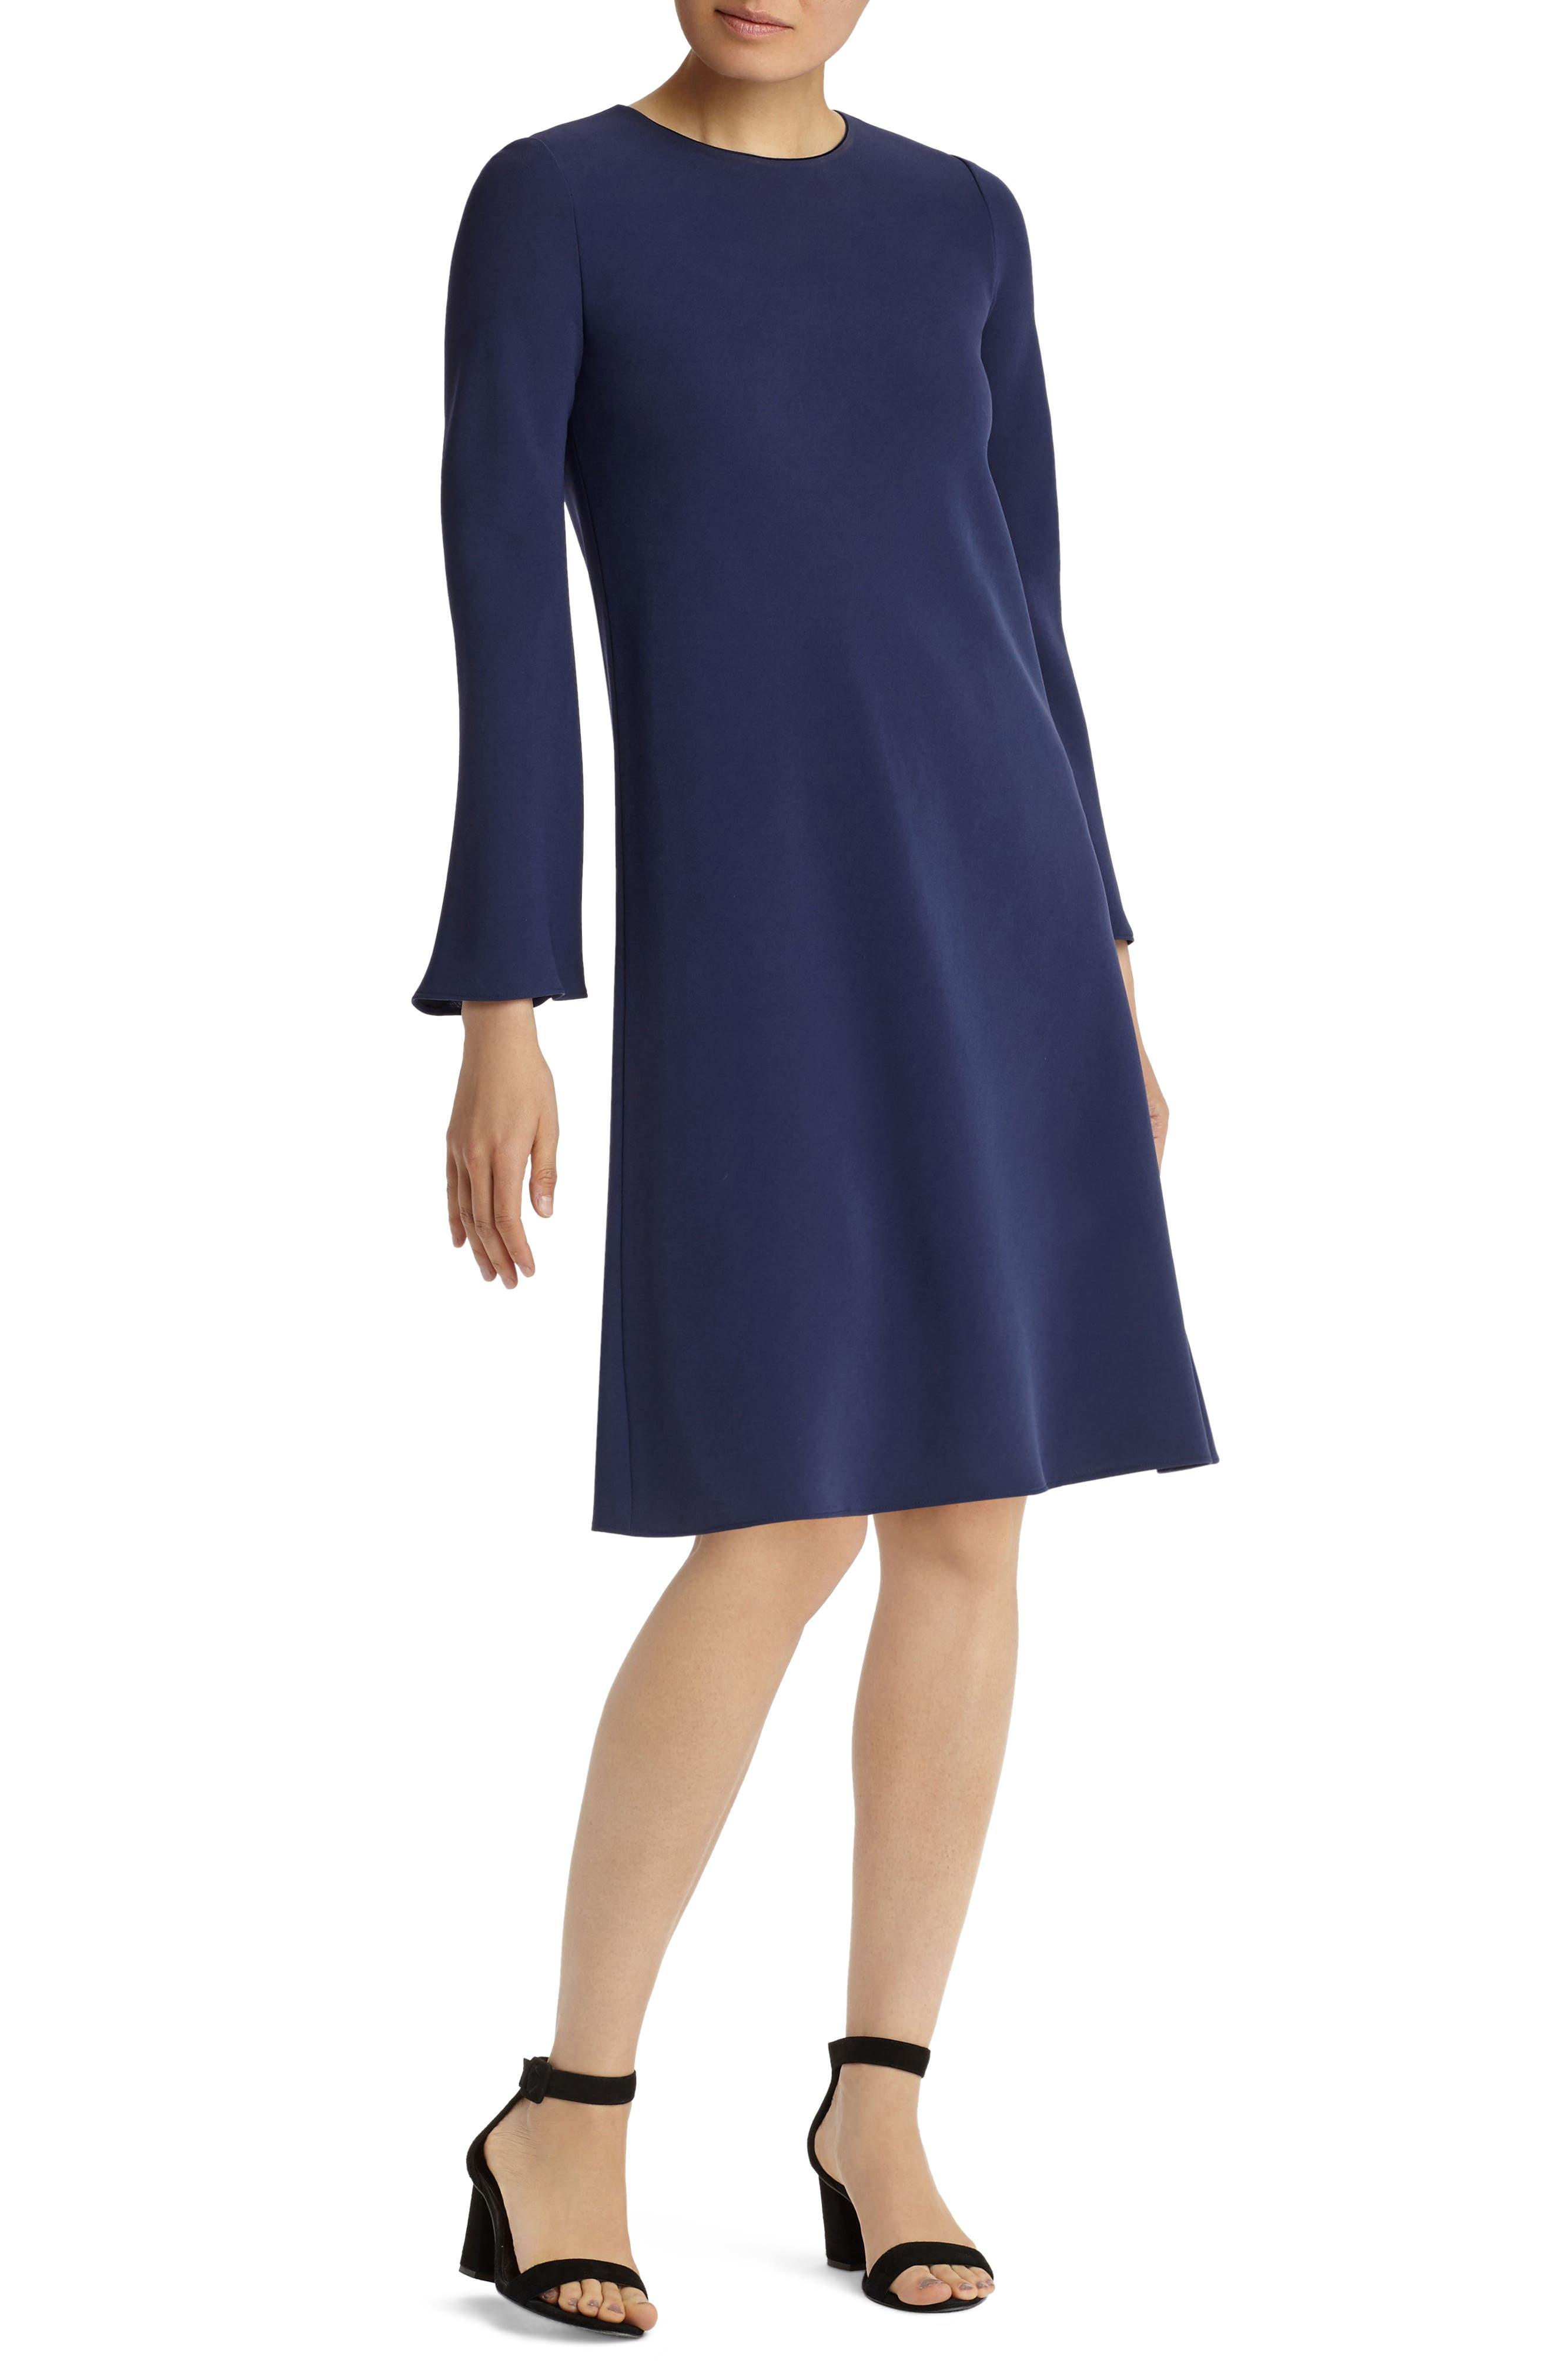 Alternate Image 1 Selected - Lafayette 148 New York Kalitta Finesse Crepe Dress